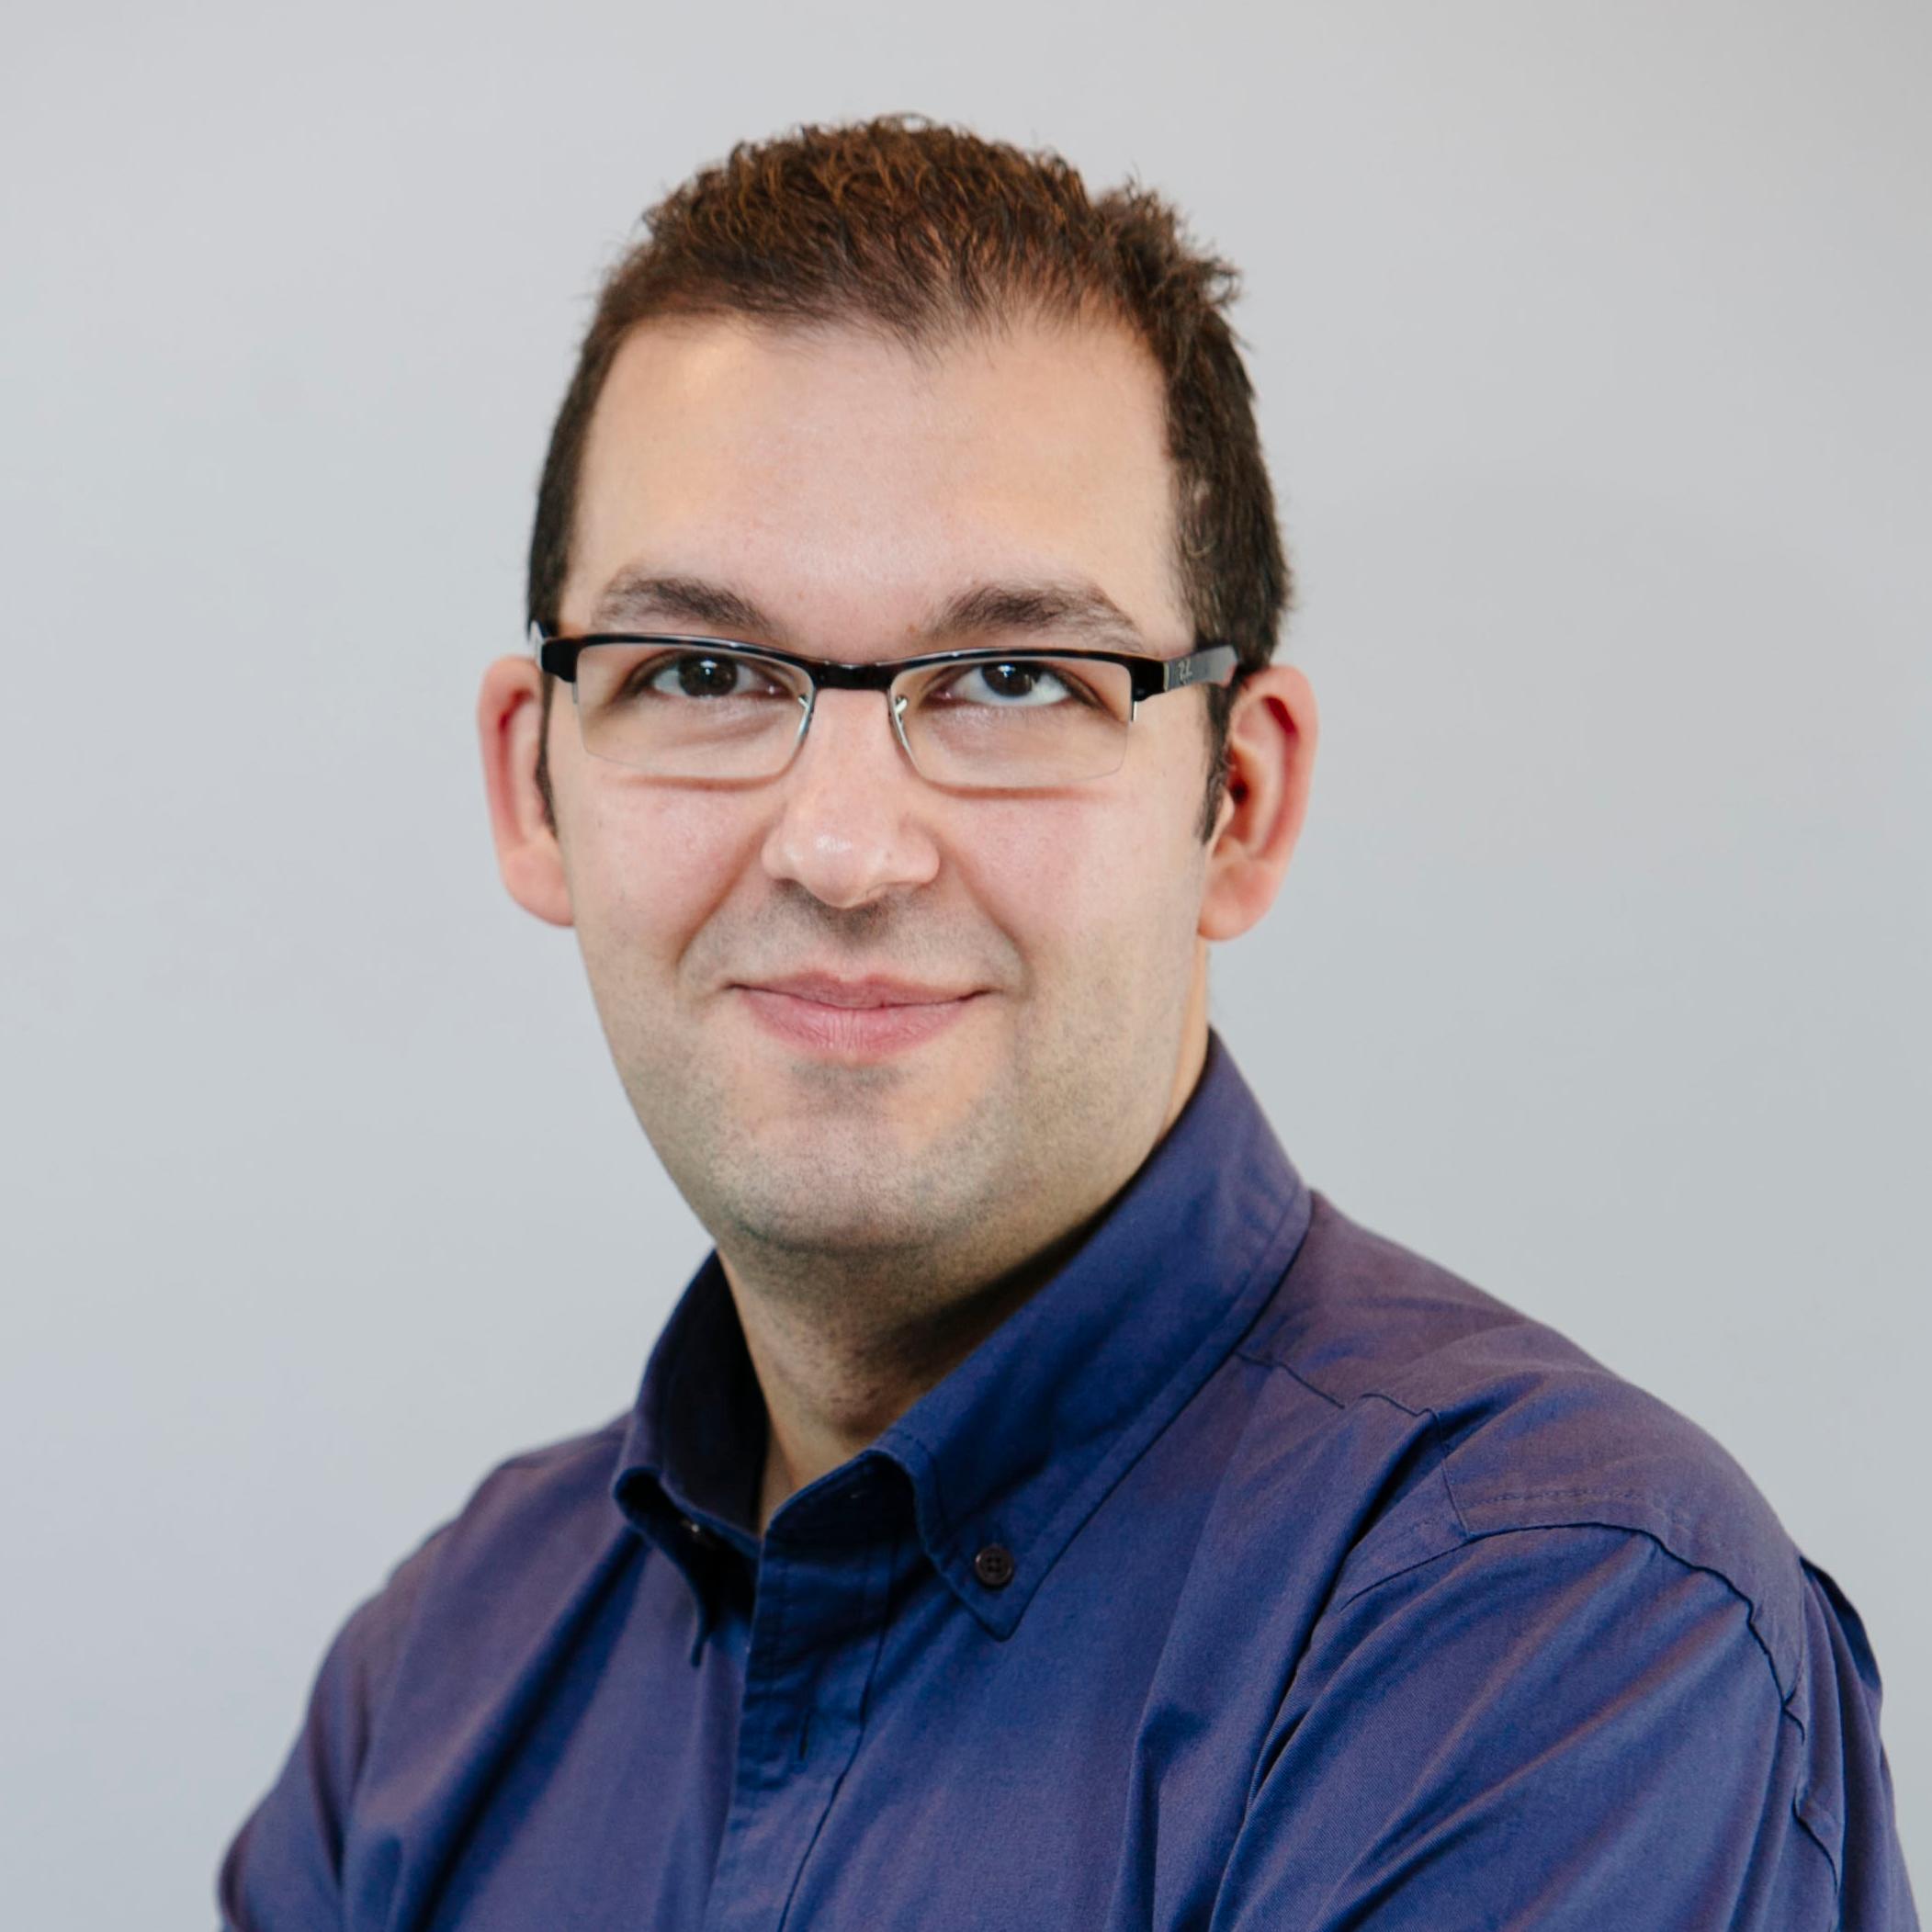 Ruymán Jiménez Social Profile